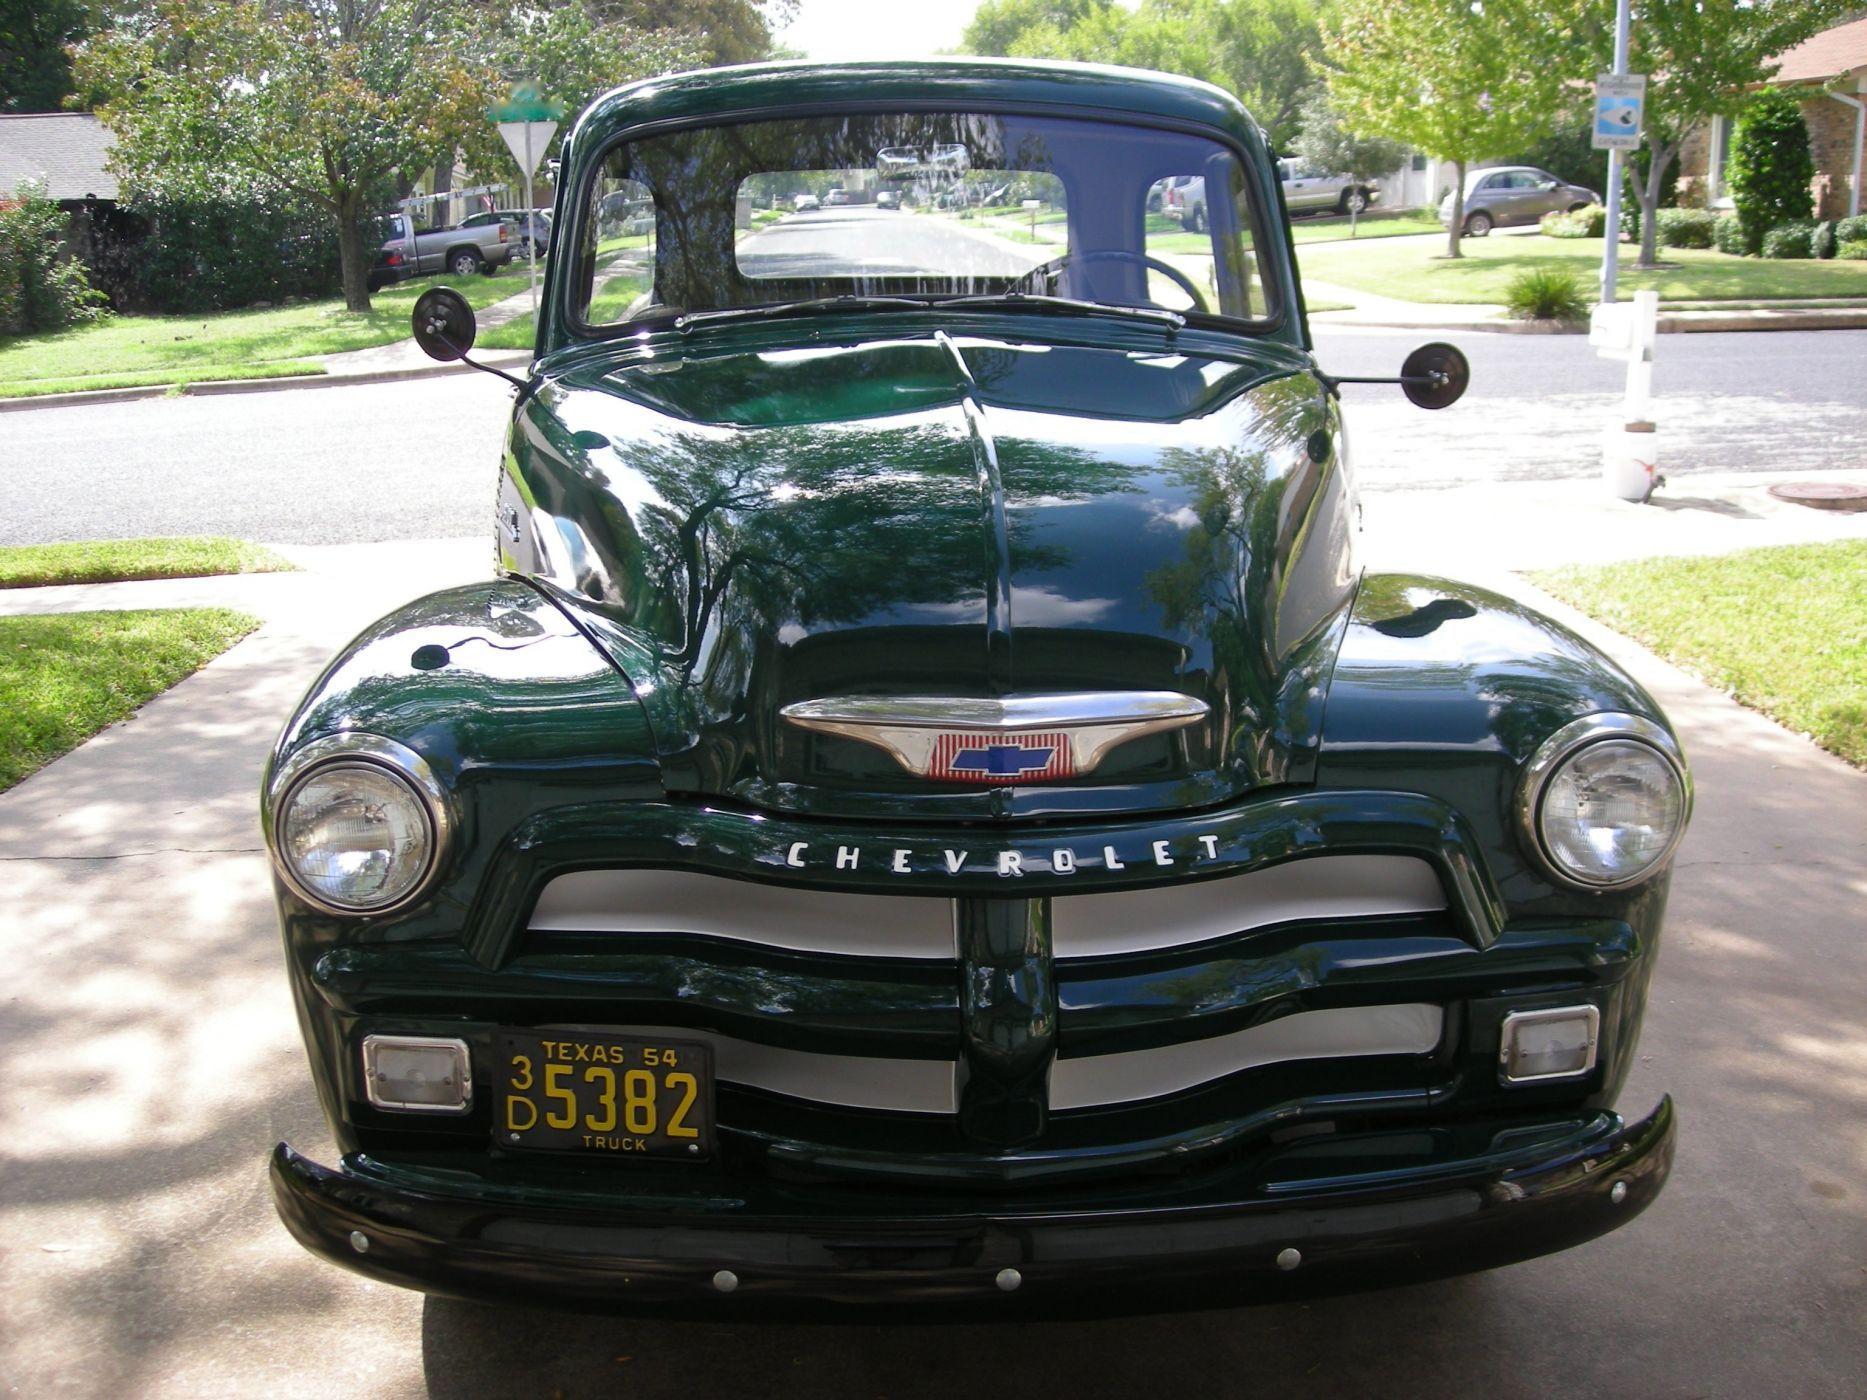 1954 Chevrolet 3100 Pickup Retro Wallpaper Vintage Pickup Trucks Chevrolet Chevrolet 3100